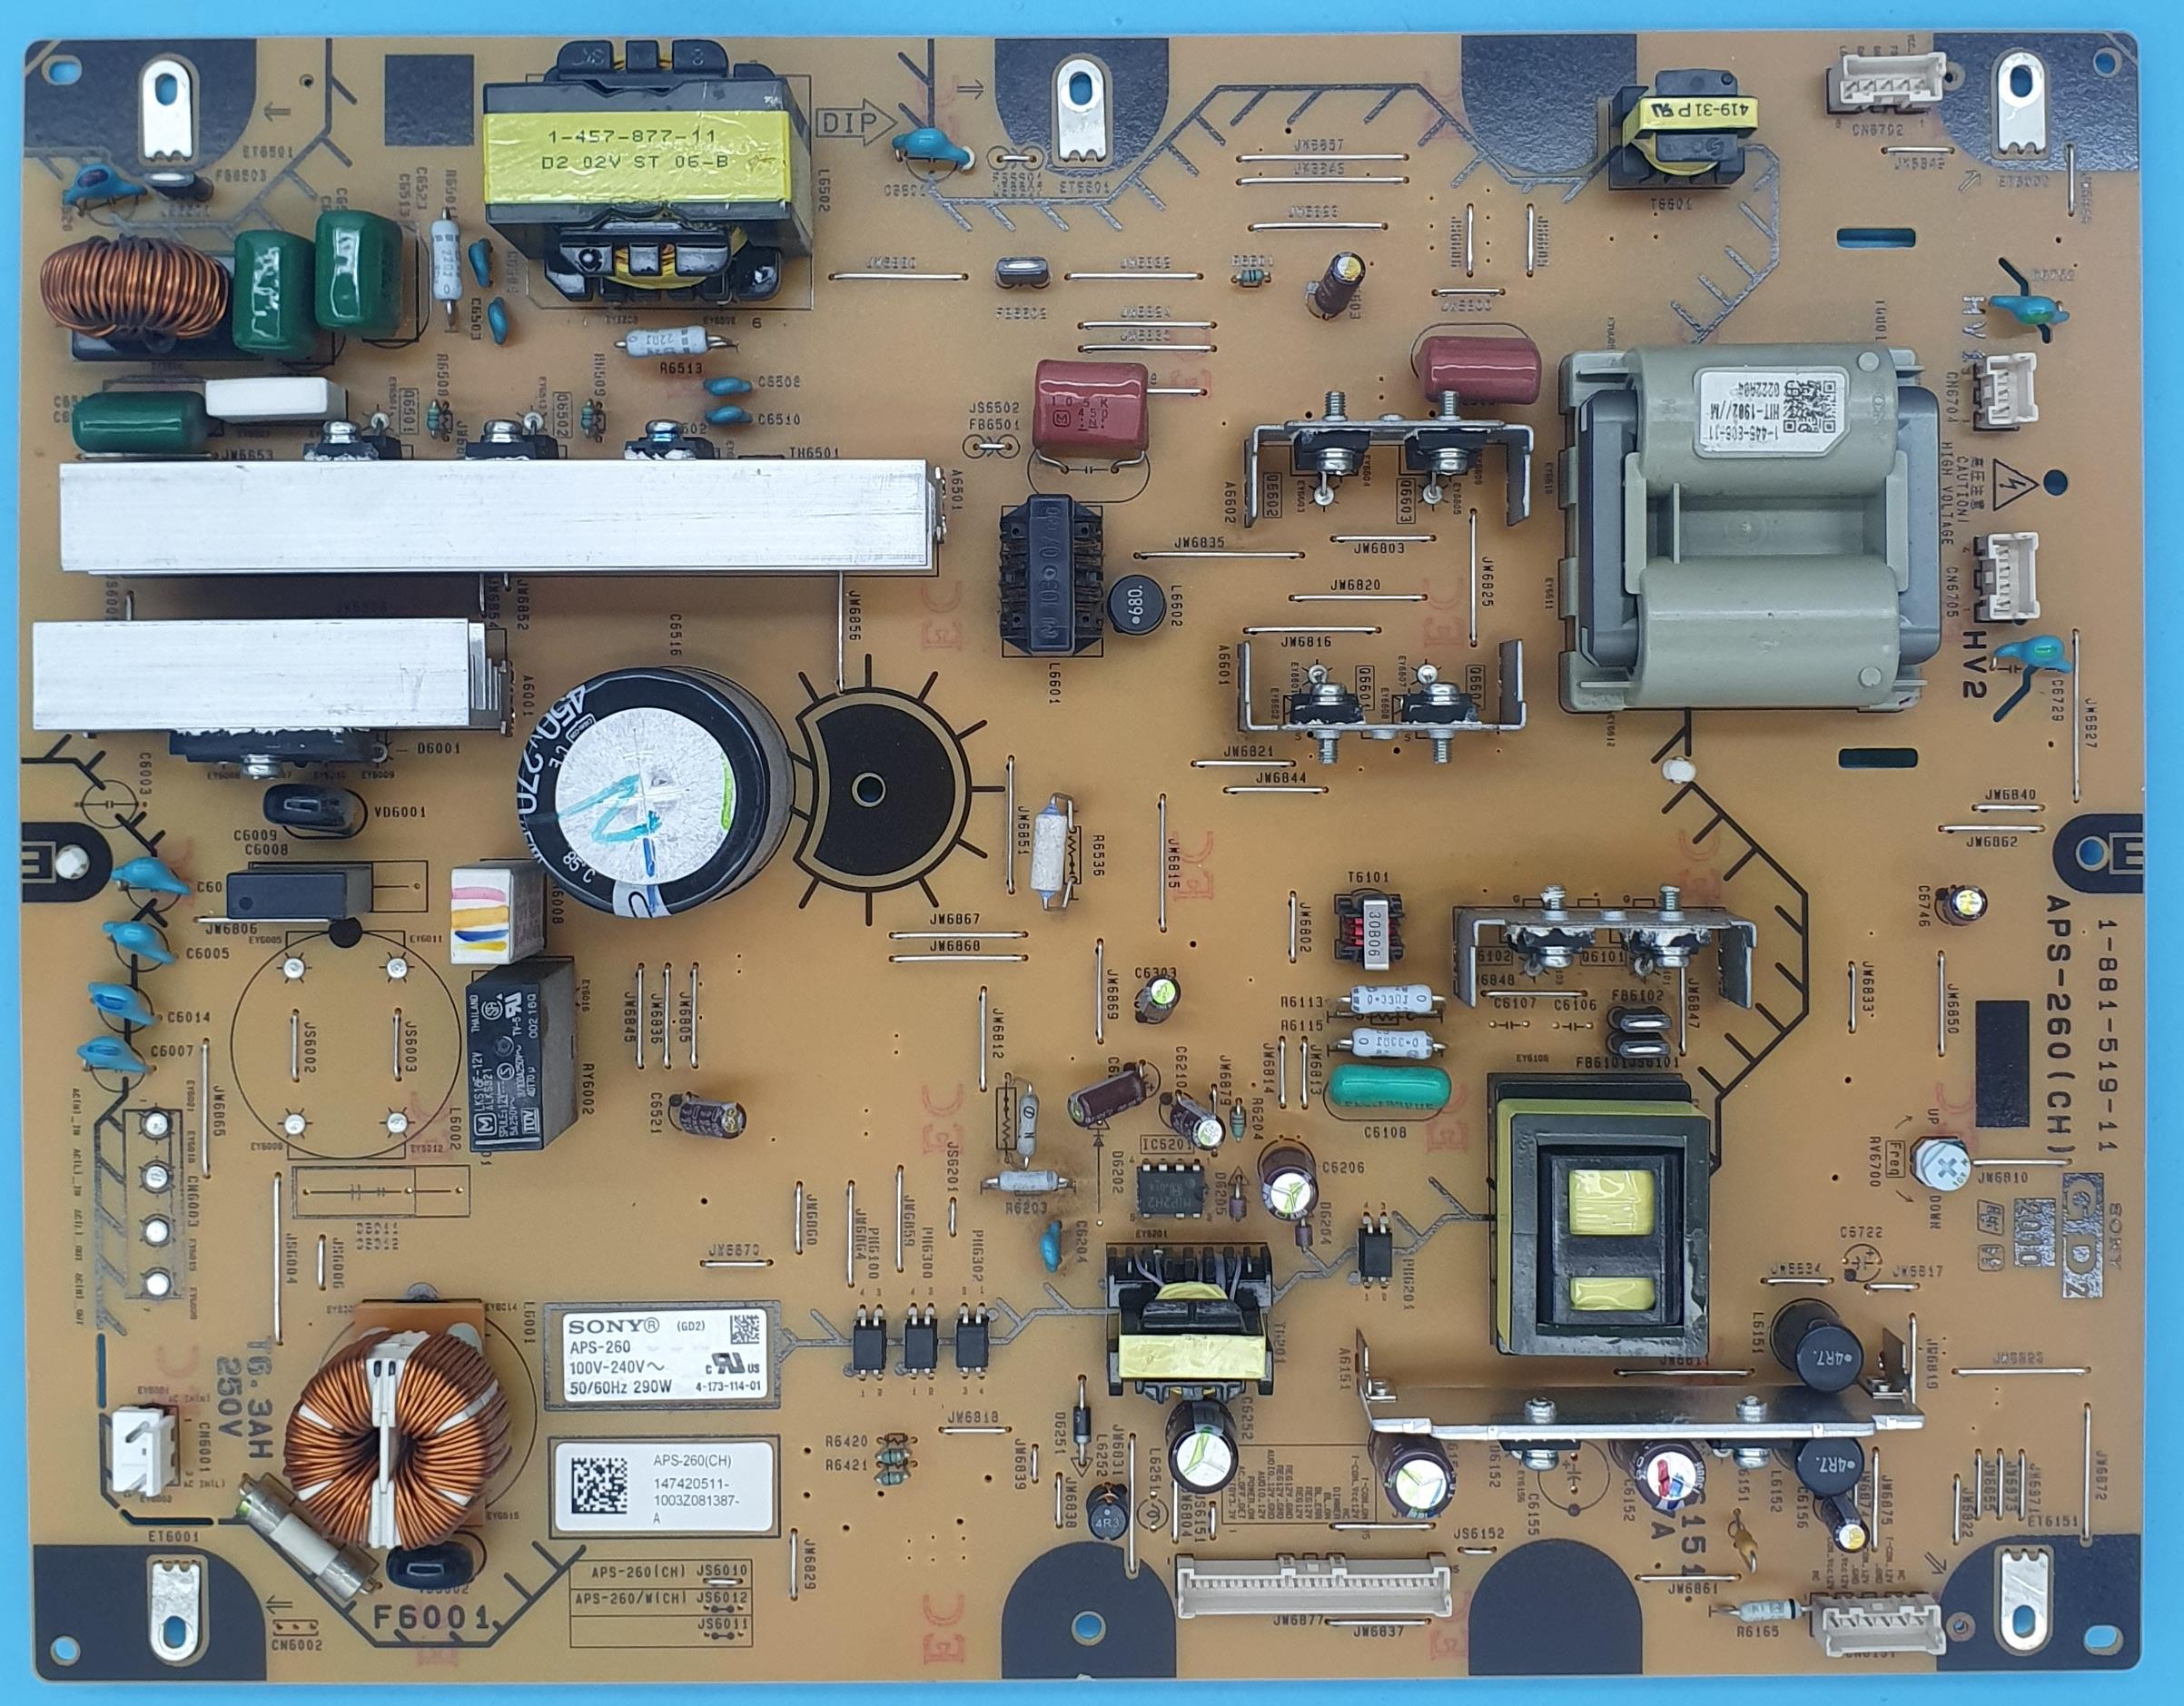 1-881-519-11 Sony Power (KDV DAHİL = 150 TL)